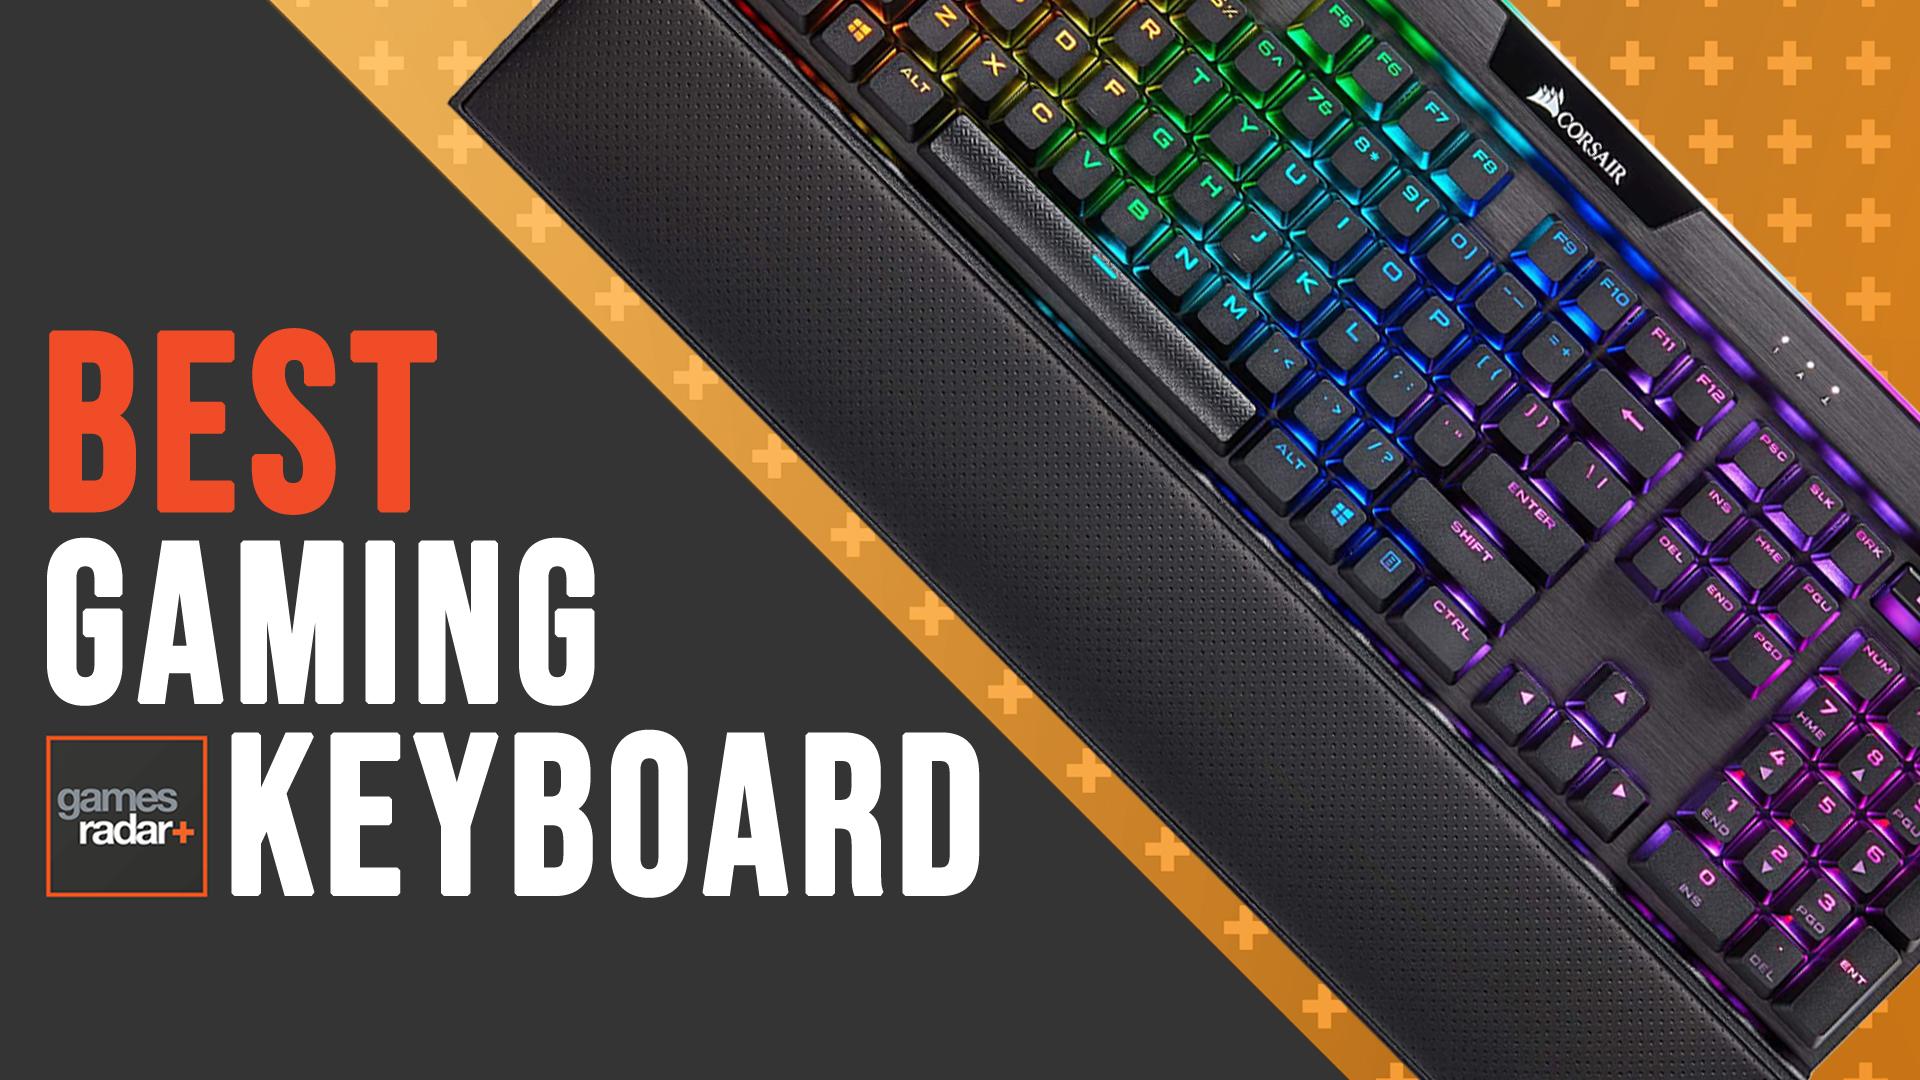 Best Gaming Keyboards 2020 Reliable Winners From Corsair Razer Steelseries And More Gamesradar